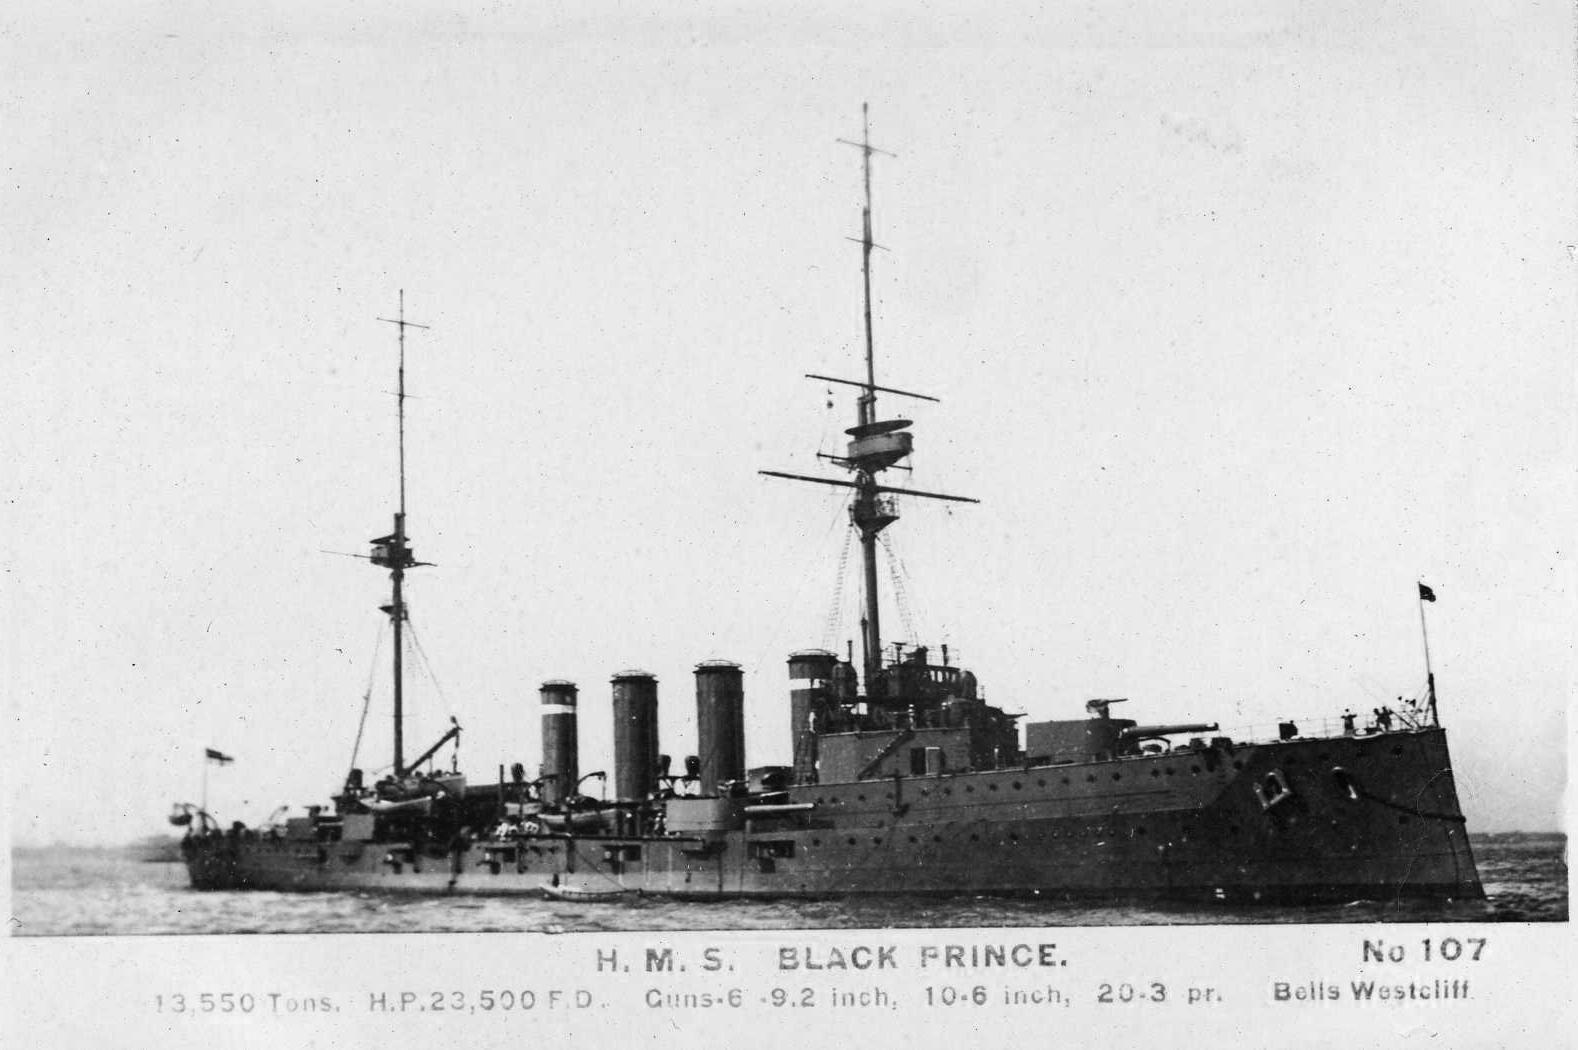 HMS Black Prince - photo 2.jpg